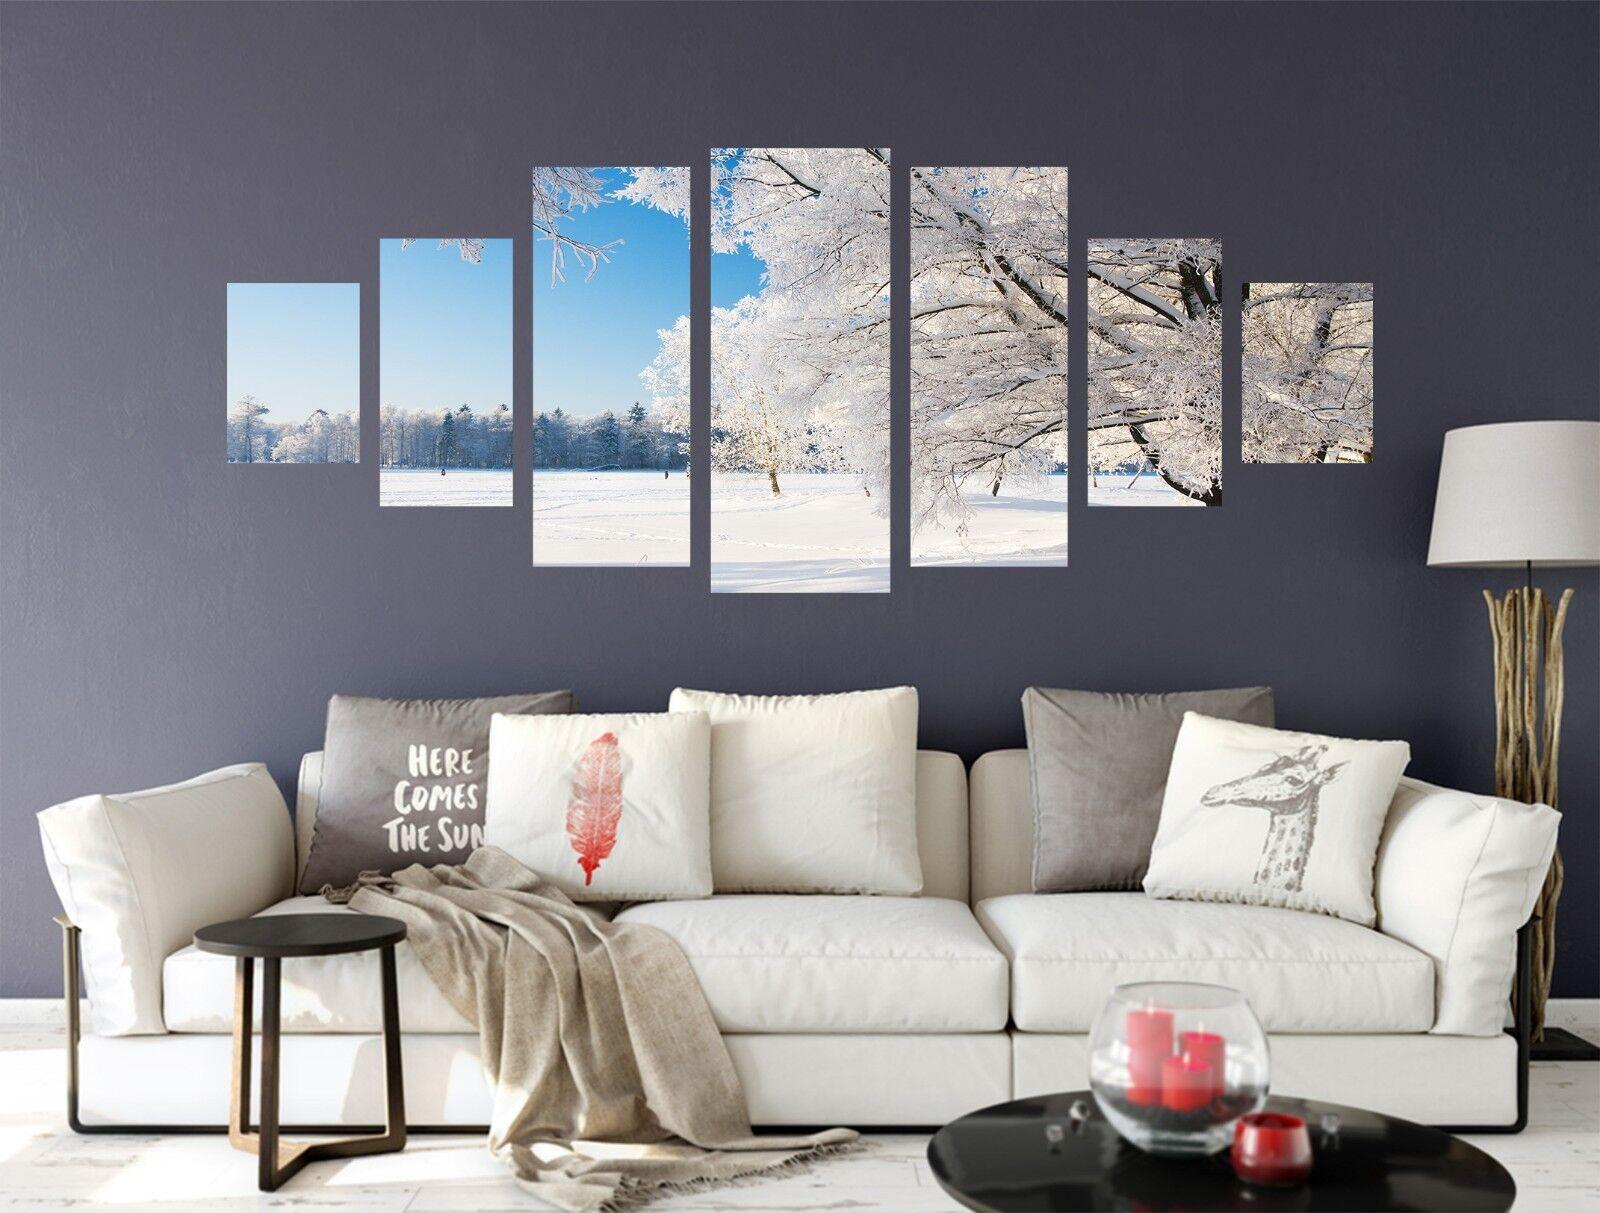 3D Snow Tree Road 72 Unframed Print Wall Paper Decal Wall Deco Indoor AJ Jenny